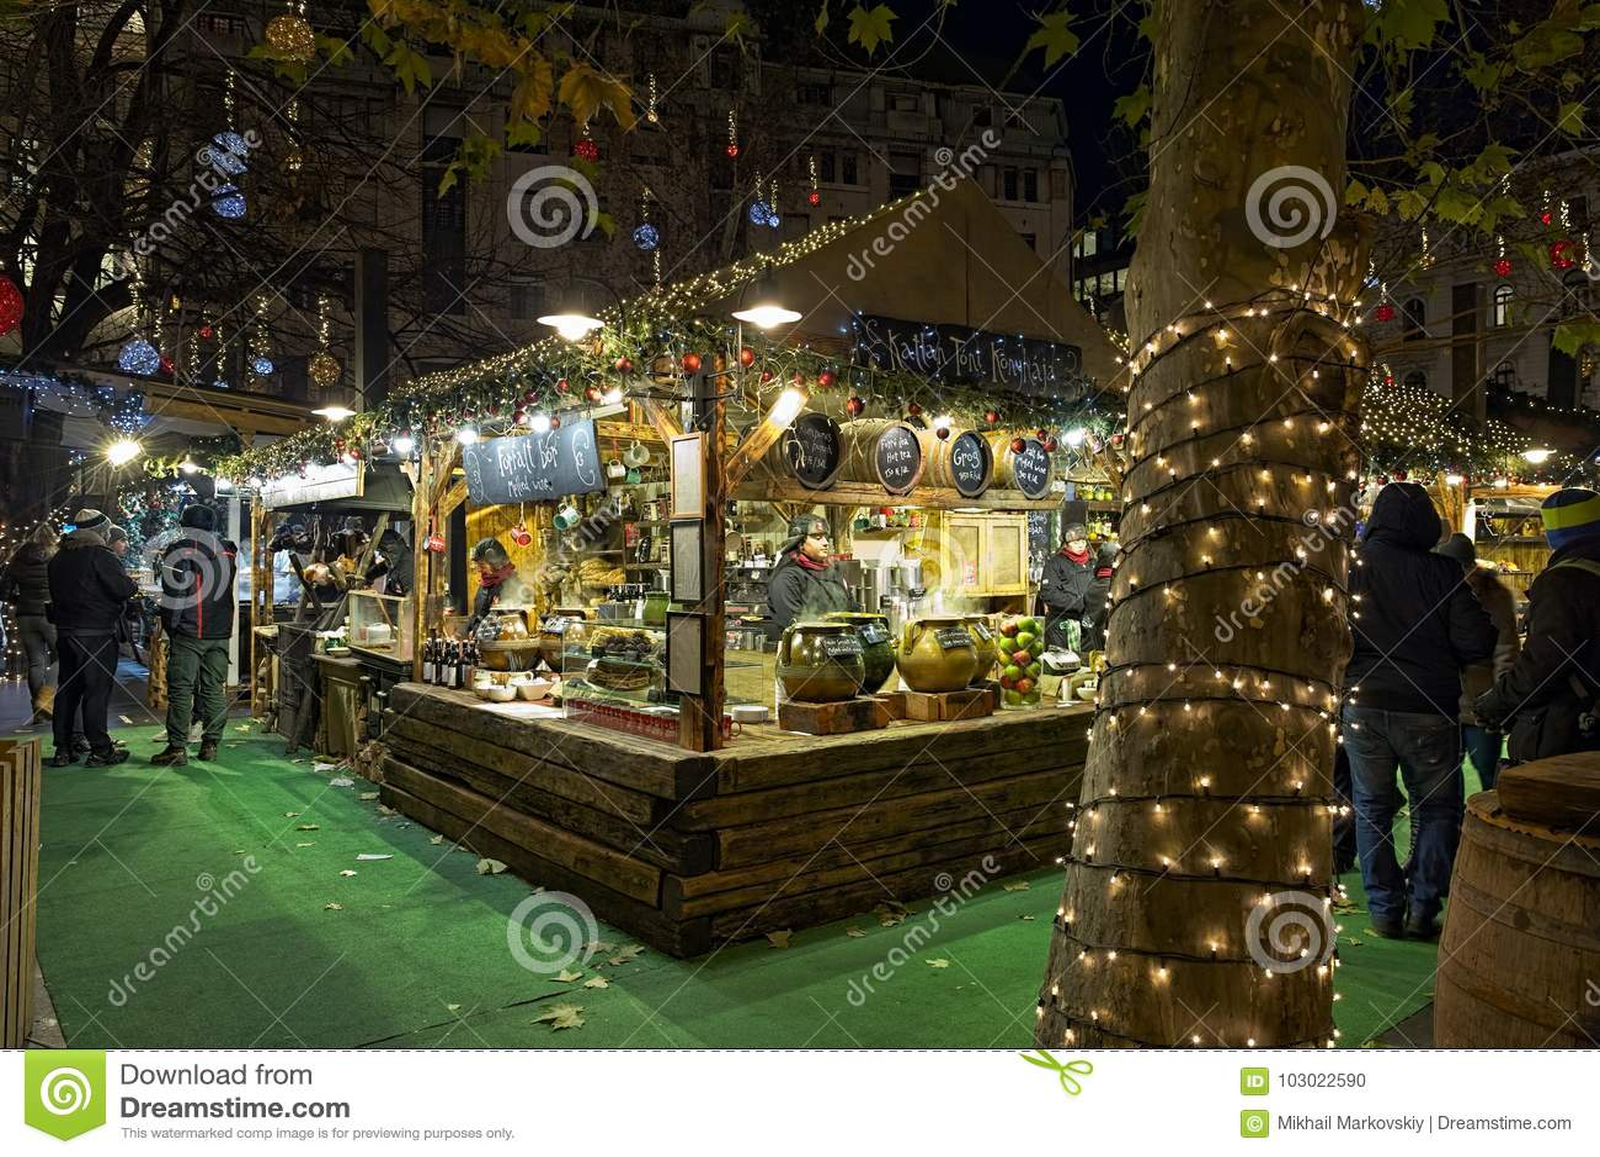 Vorosmarty Square Budapest Christmas Market.Christmas Market At Vorosmarty Square In Budapest Hungary